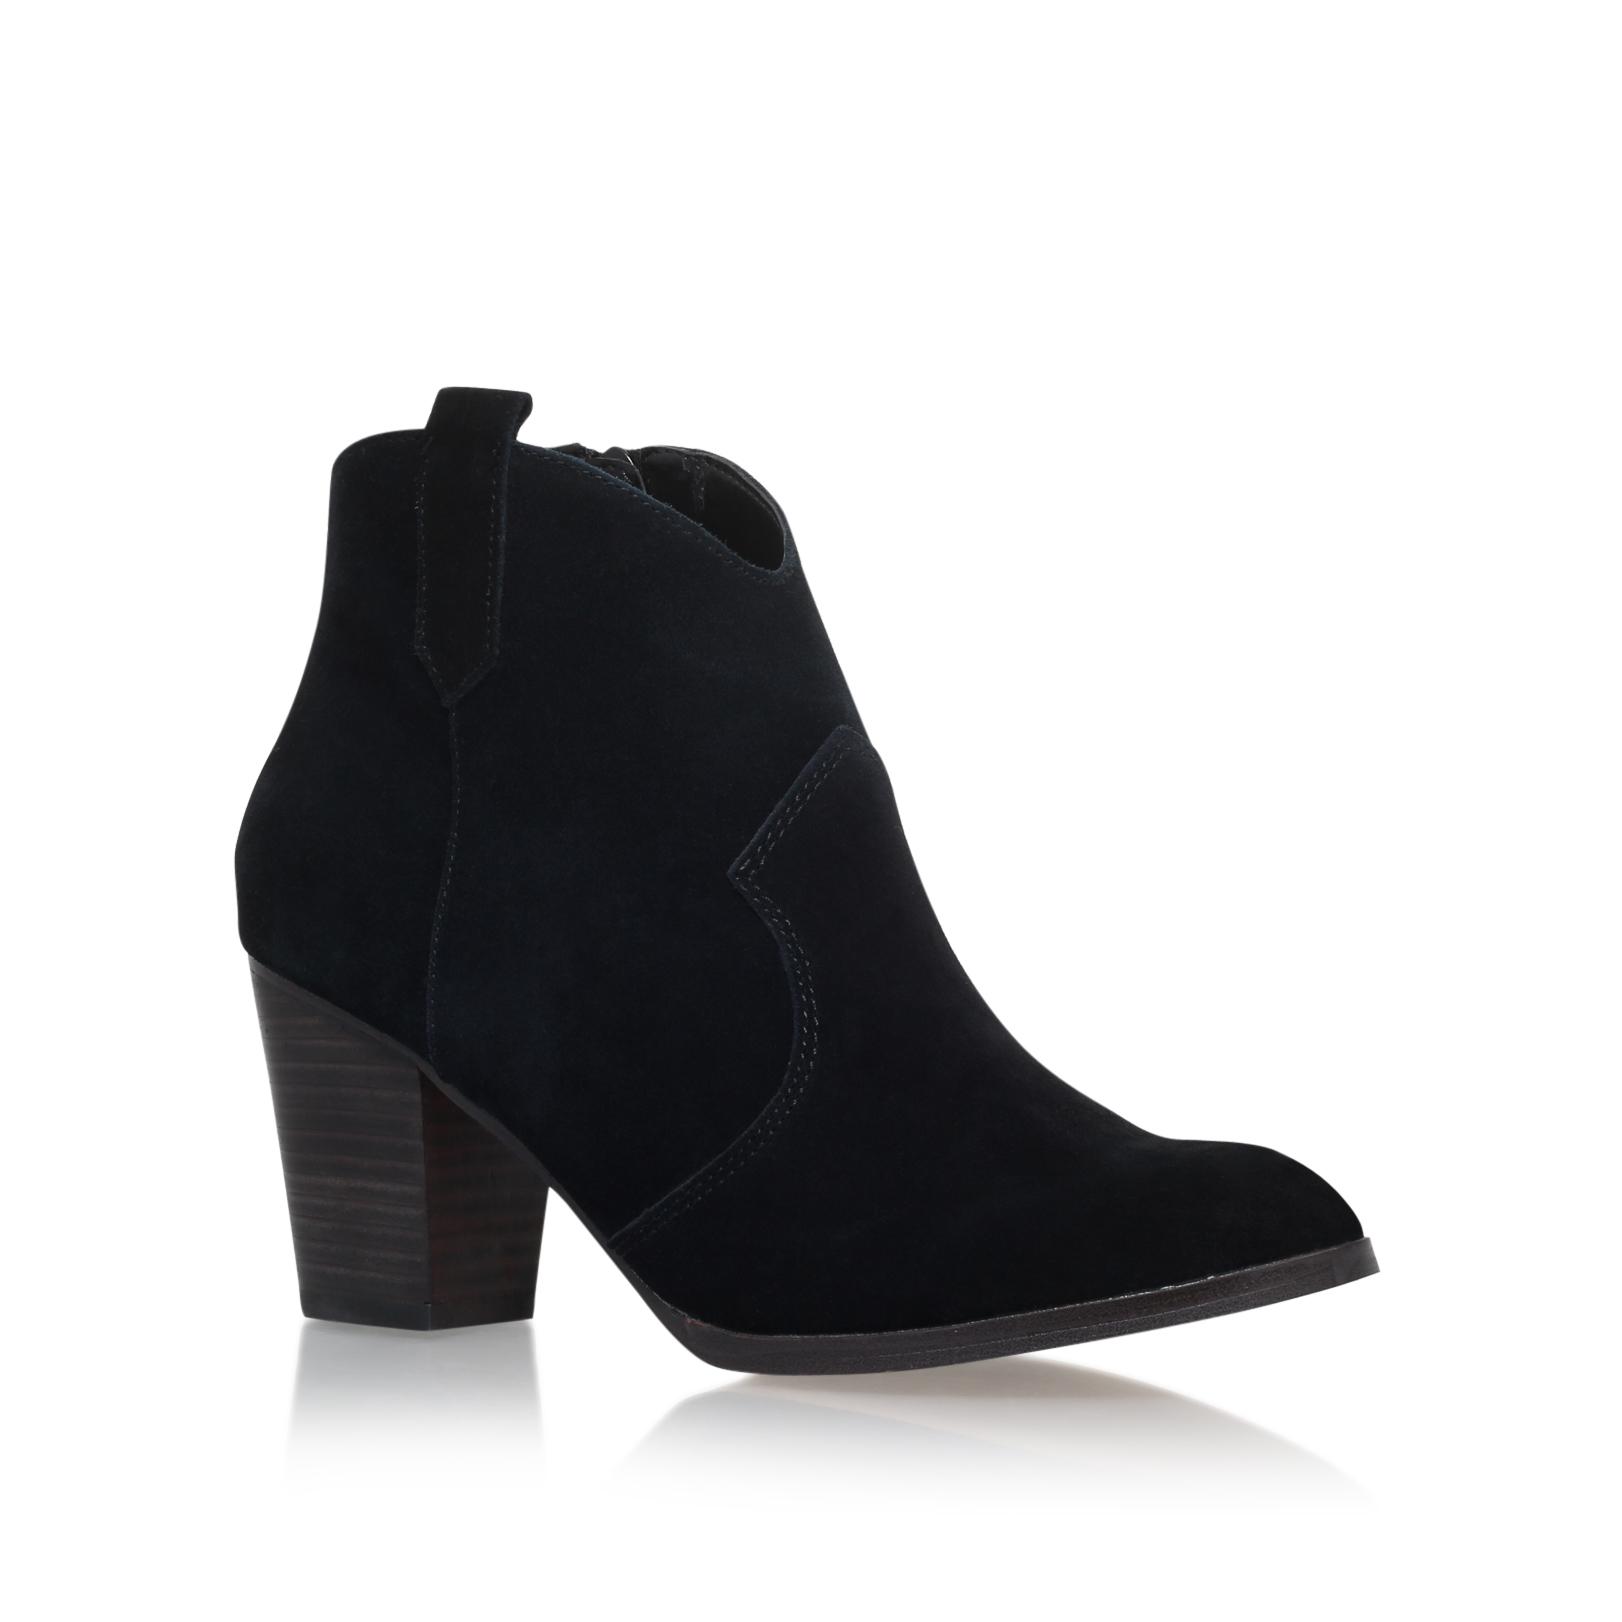 da9f34a855b Sade Mid Heel Ankle Boots | Endource